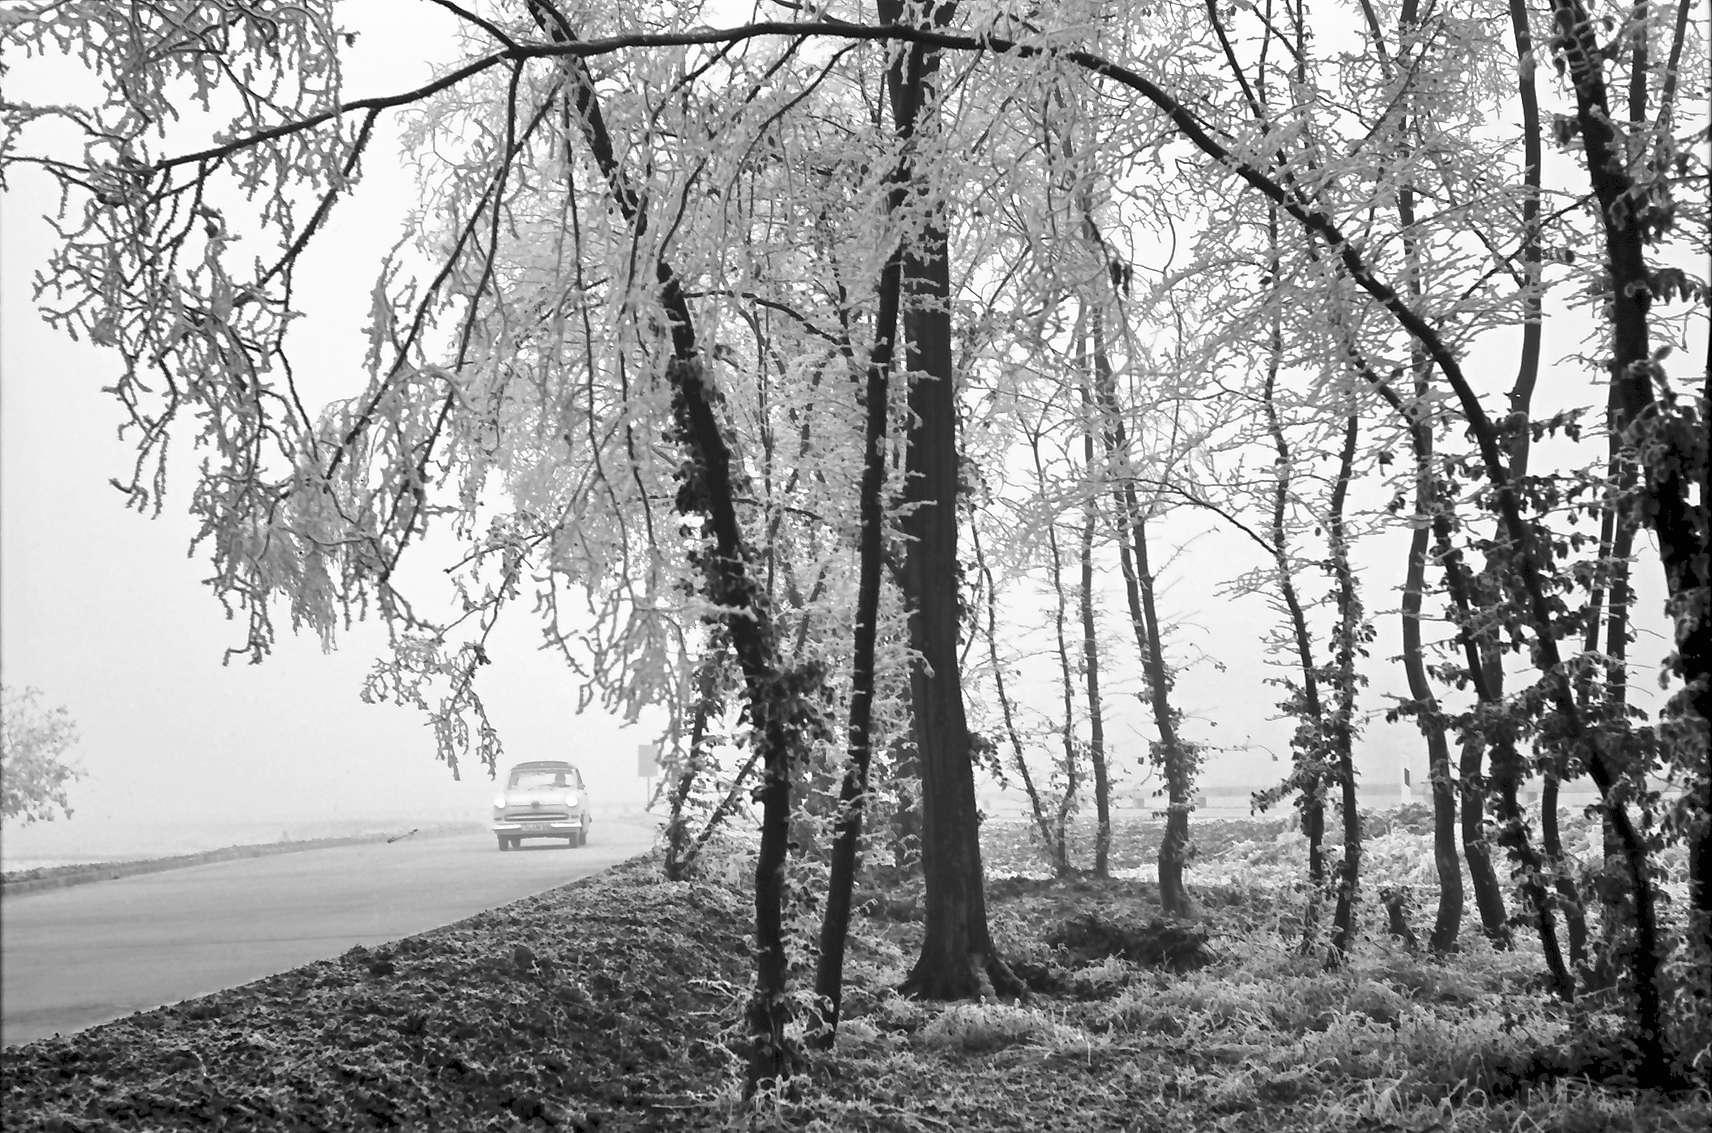 Ettenheim: Parkplatz im Rauhreif, Bild 1